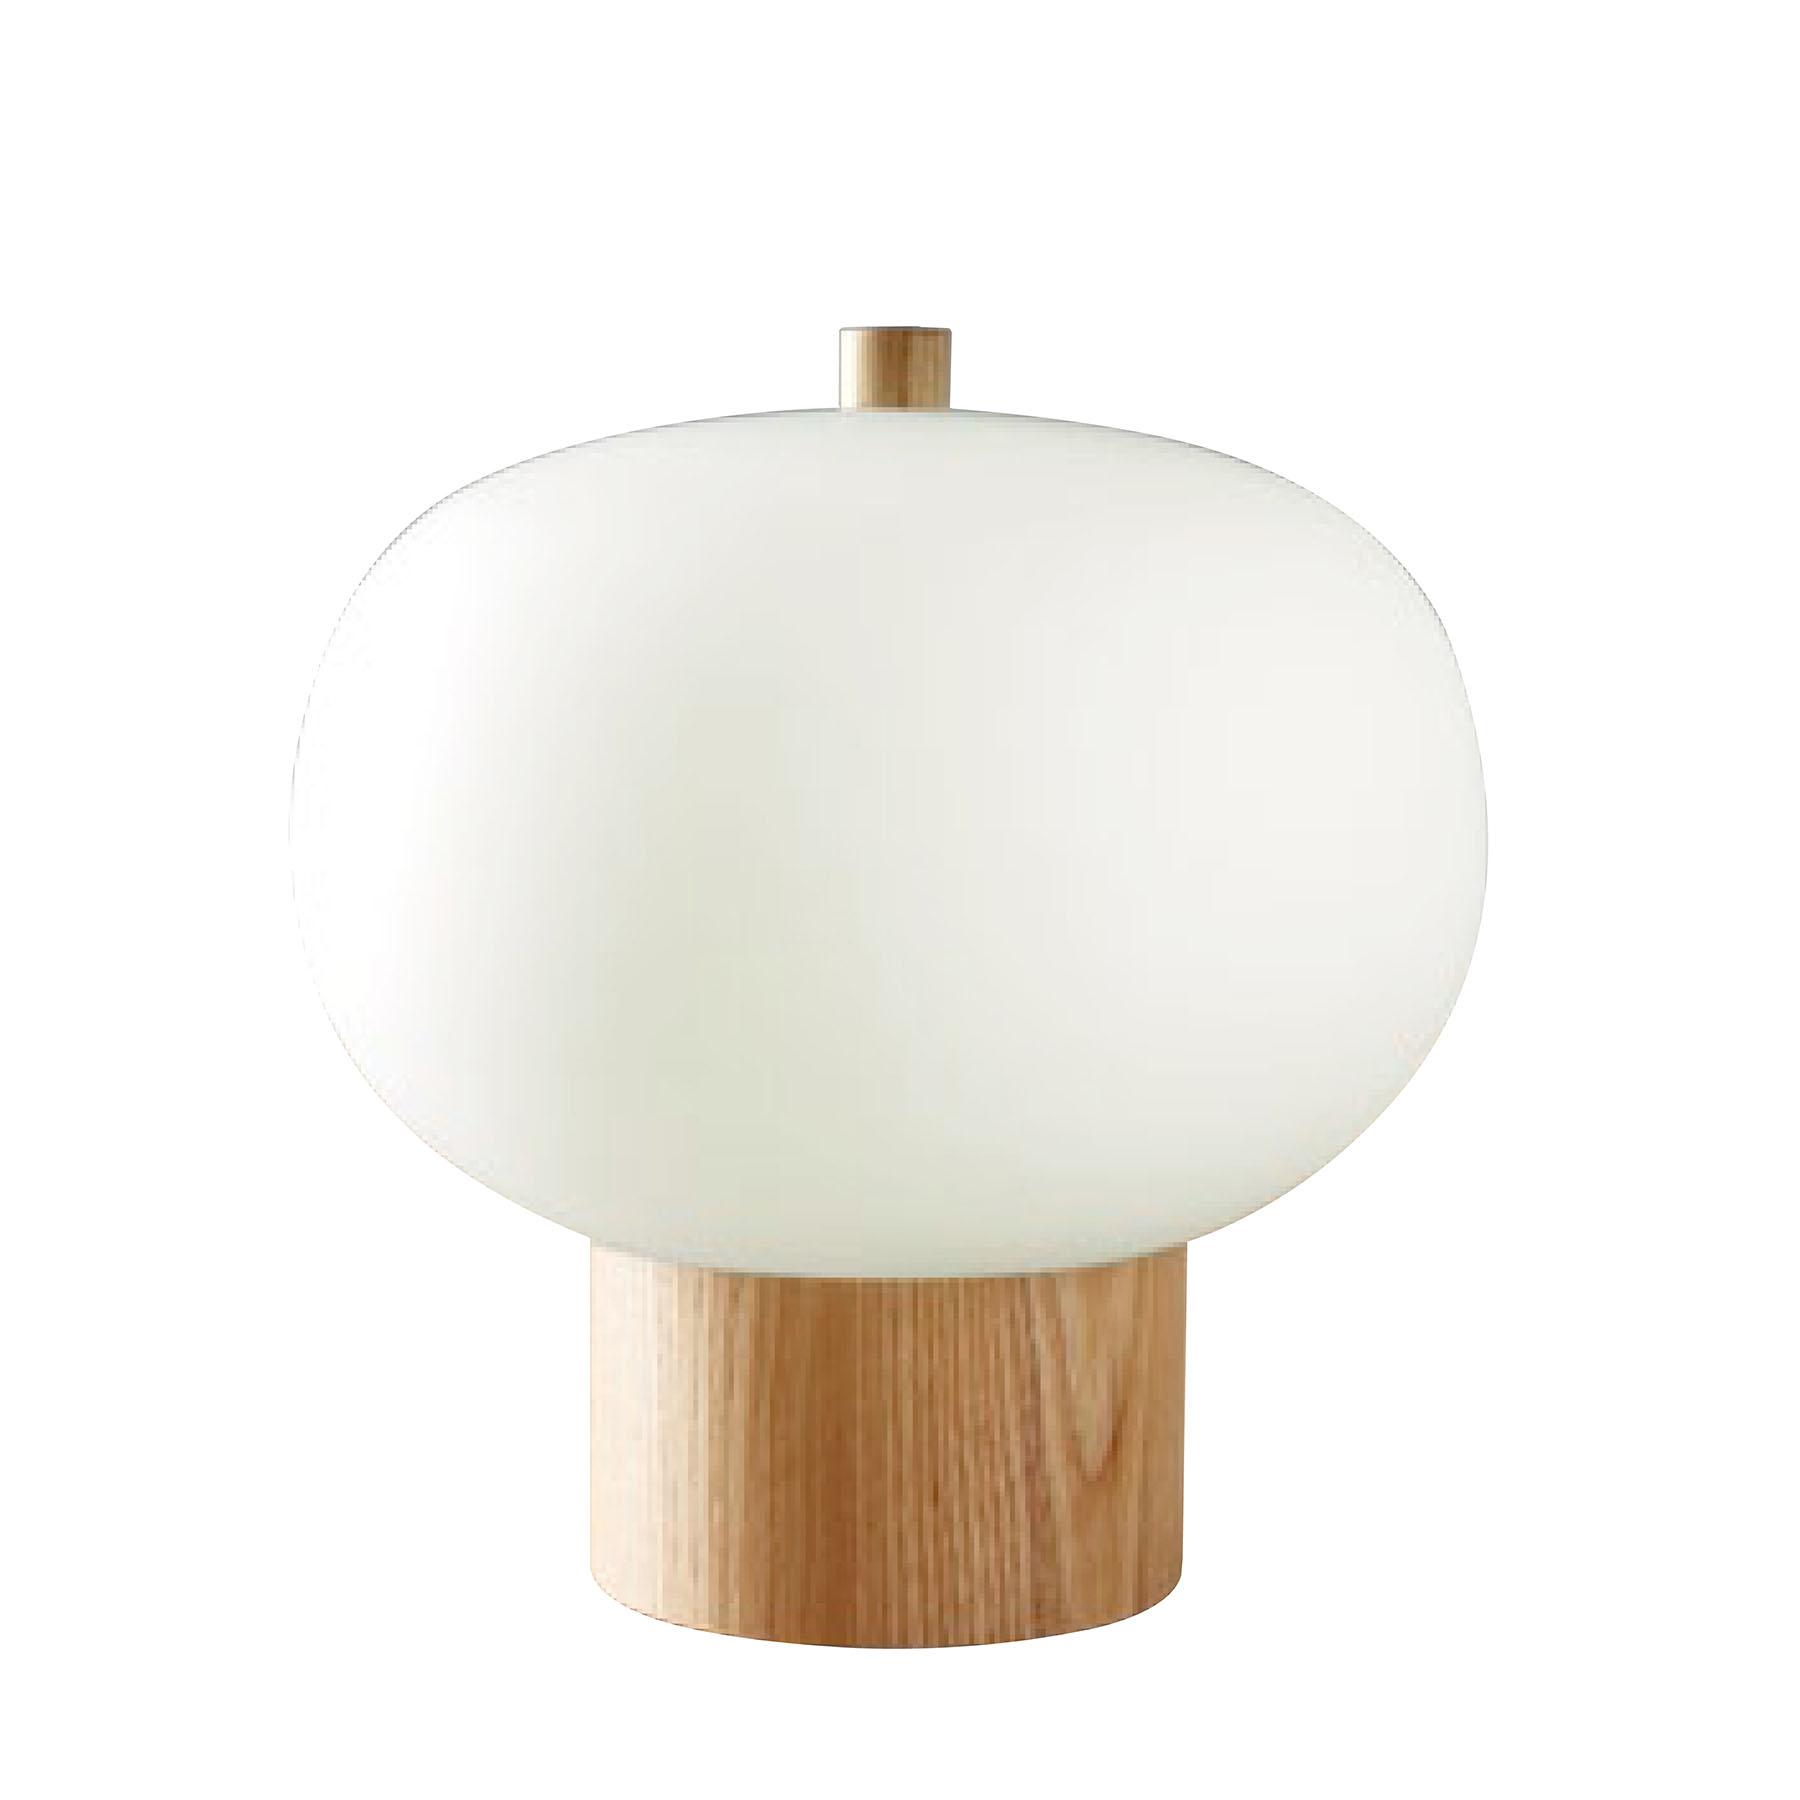 Grok Ilargi-LED-pöytälamppu Ø 24 cm Touchdimmer